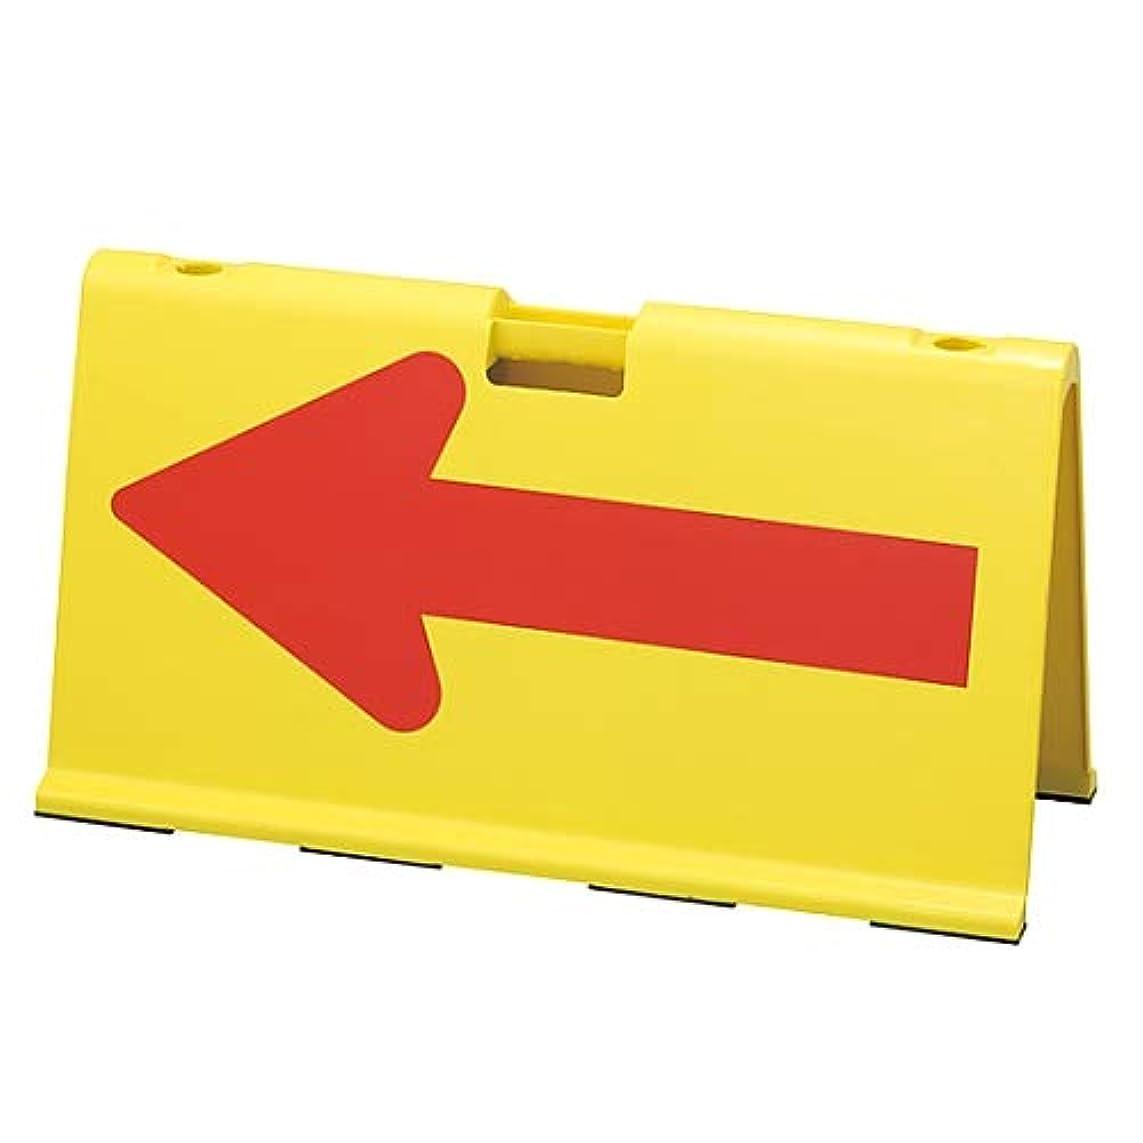 マージ壊滅的な説得日本緑十字社 方向矢印板 「←」 矢印板-AS1/61-3393-76